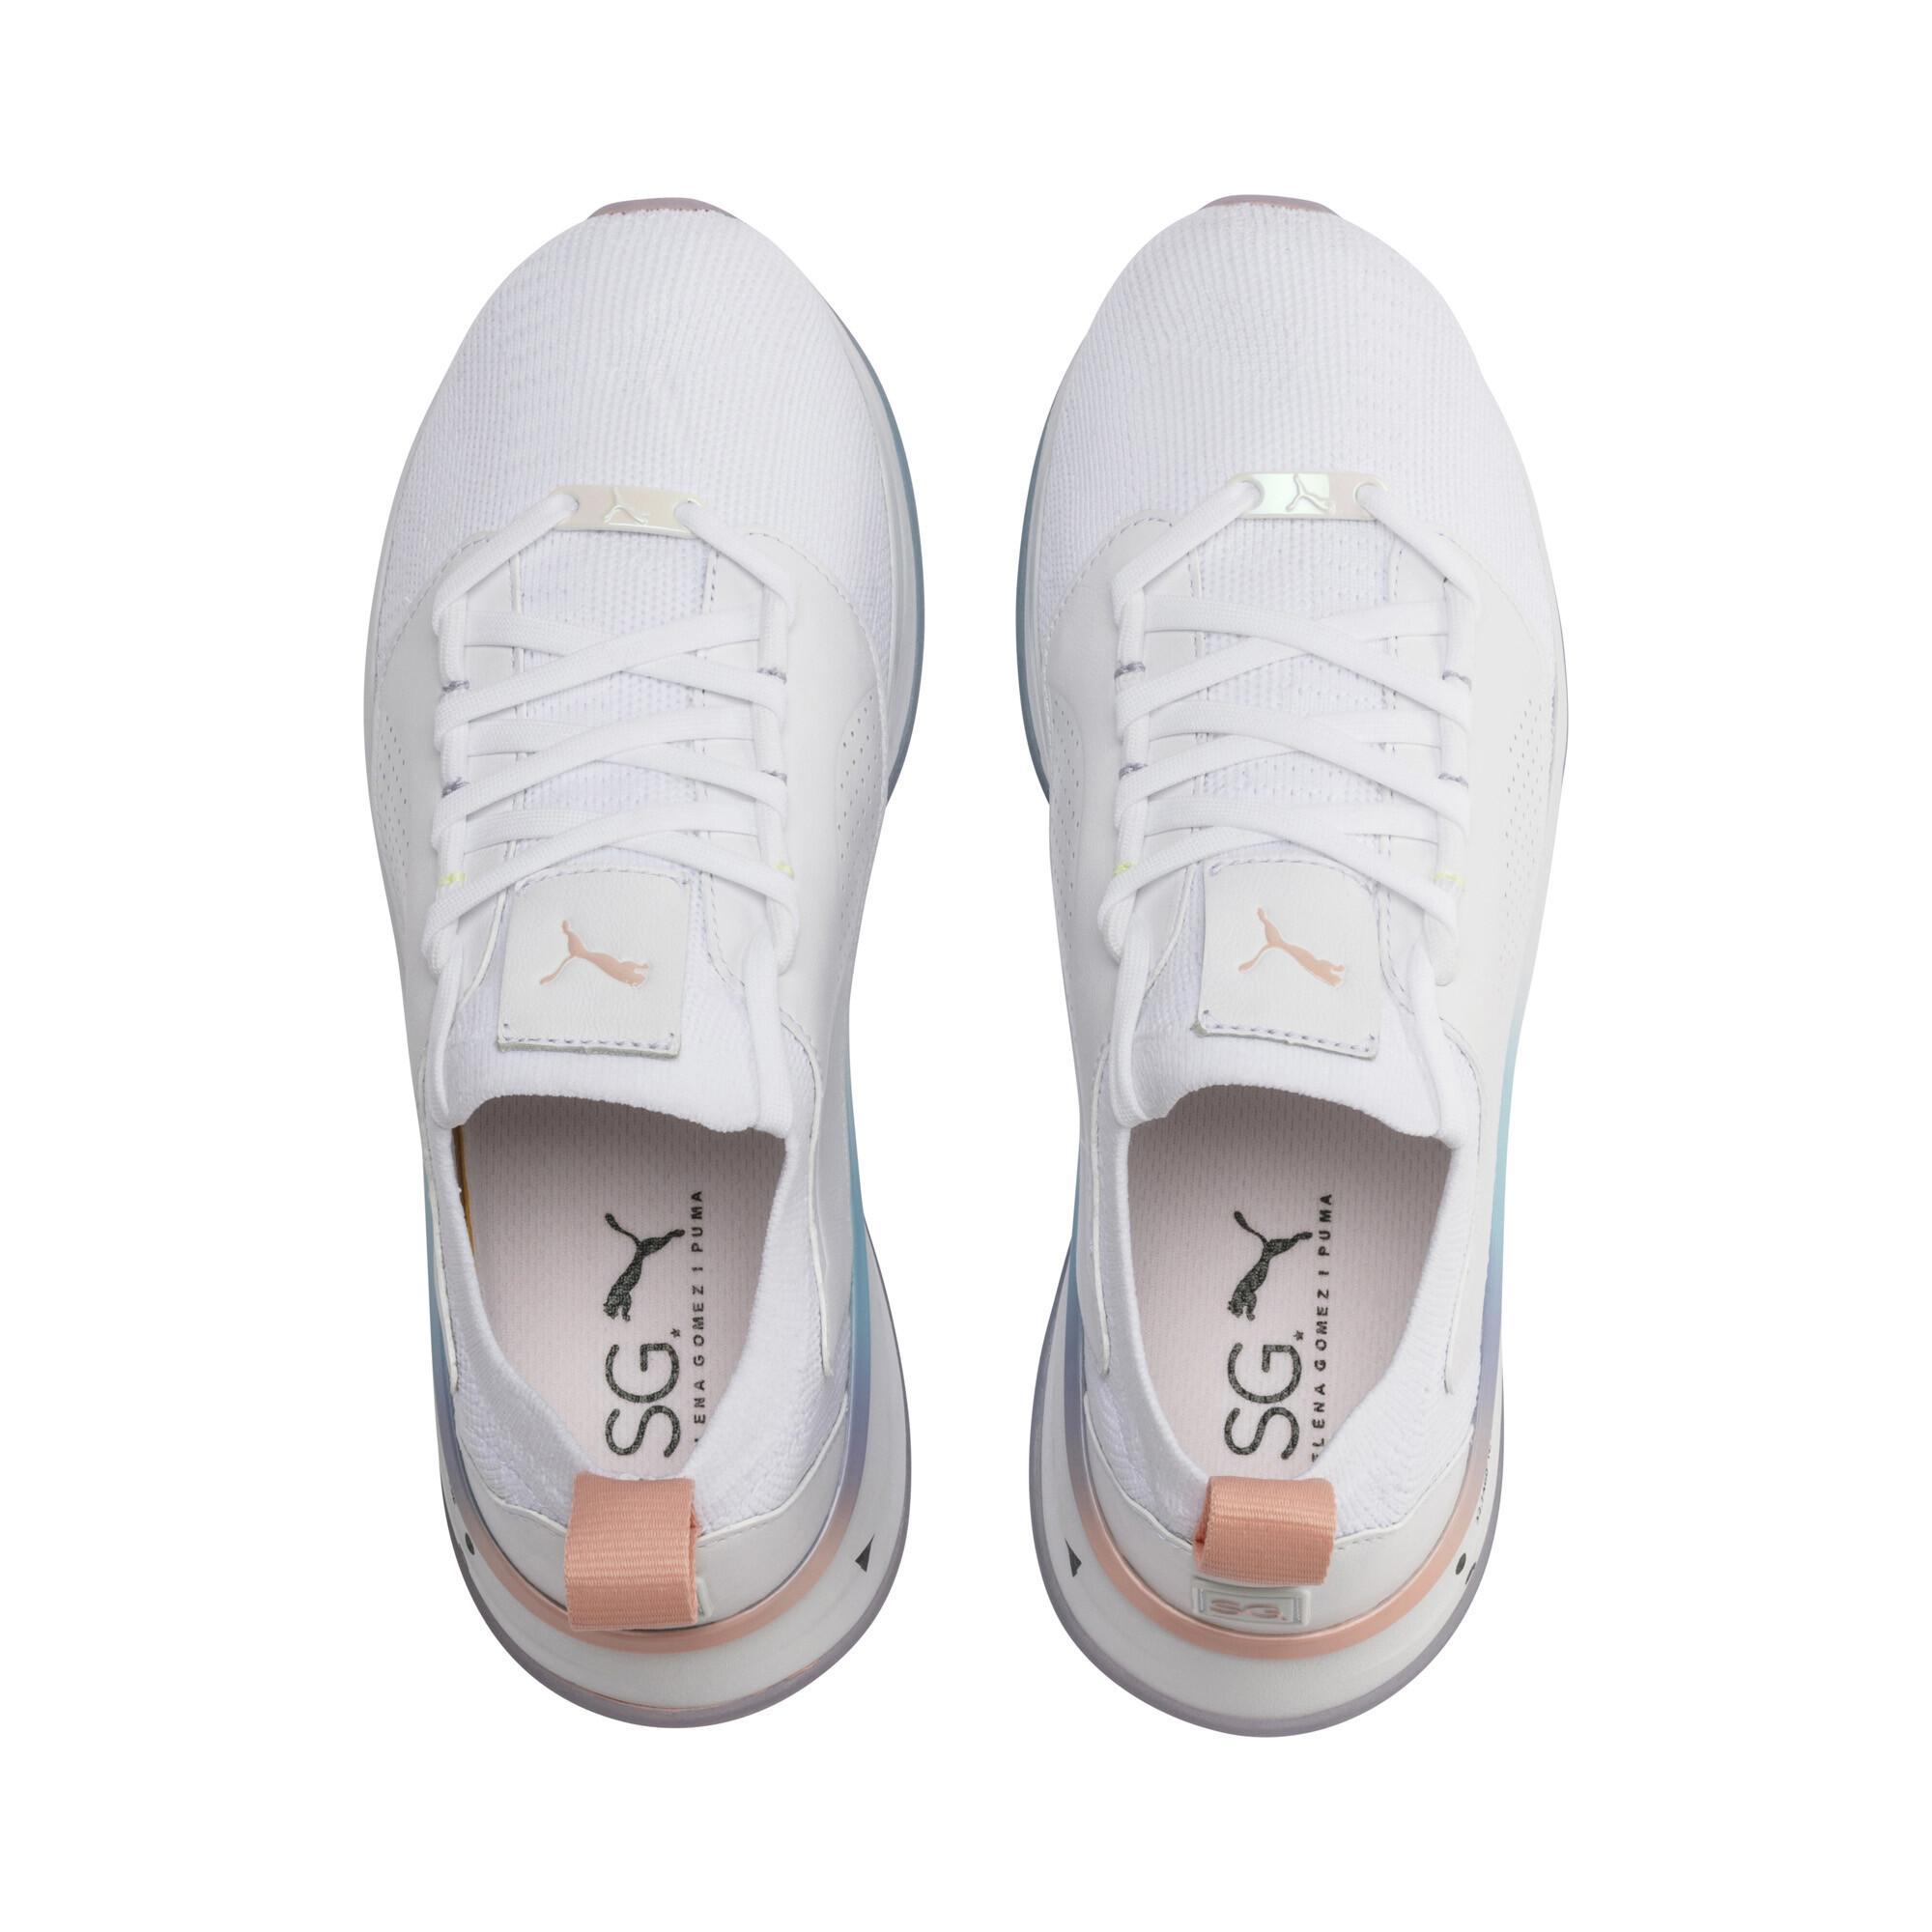 Image Puma PUMA x SELENA GOMEZ Runner Women's Training Shoes #7